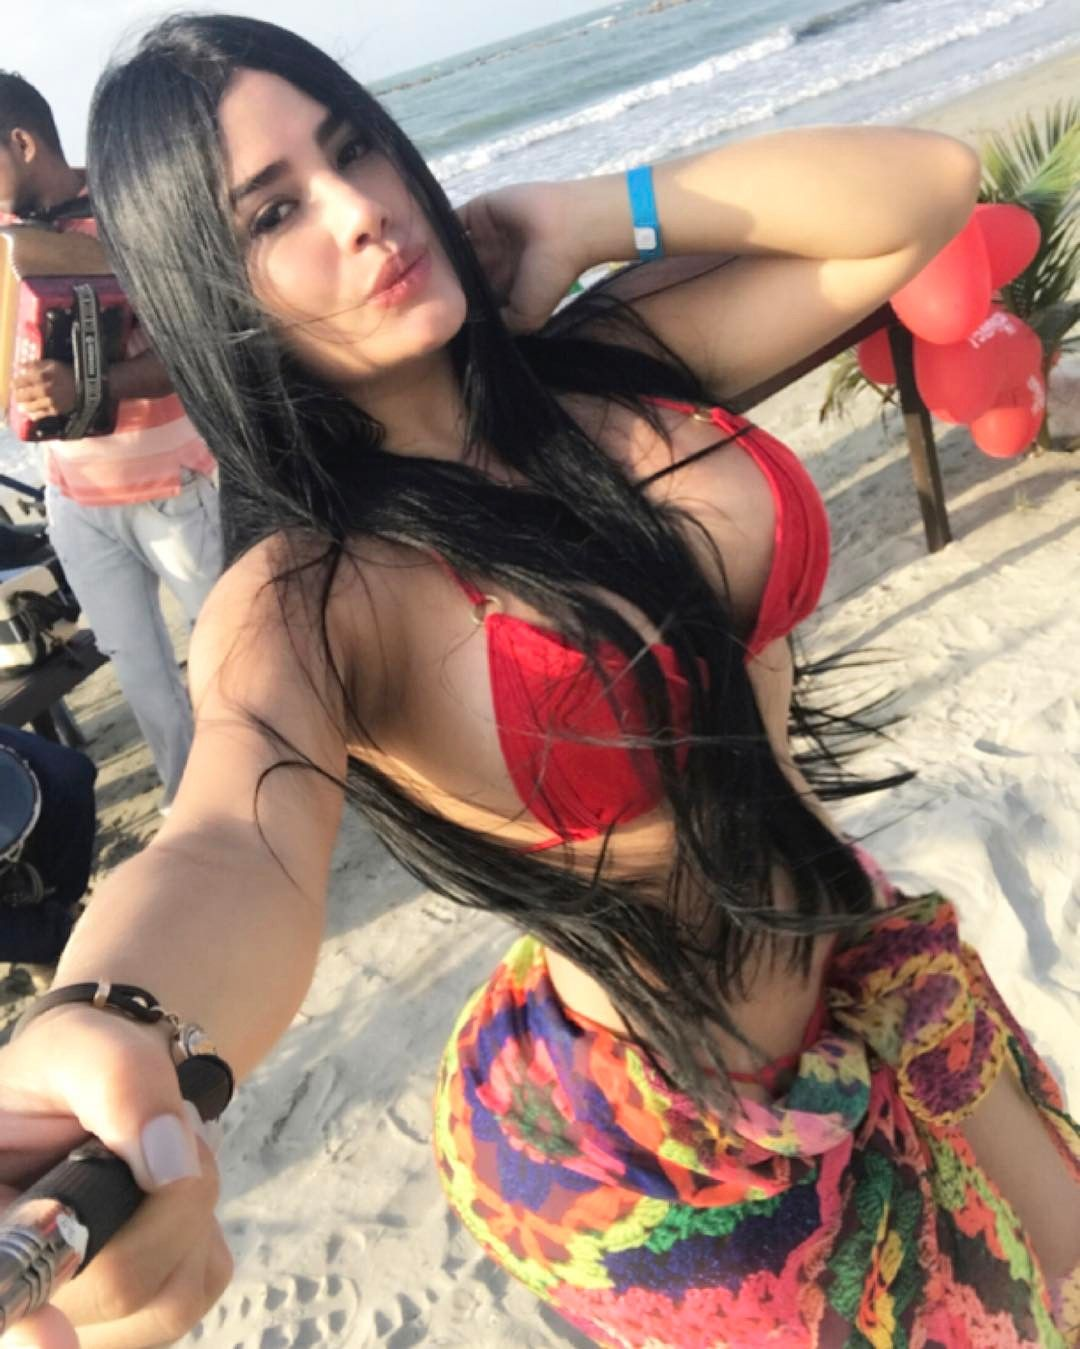 Azerbaijan girls whatsapp number for datingchatbaku call womenwgp